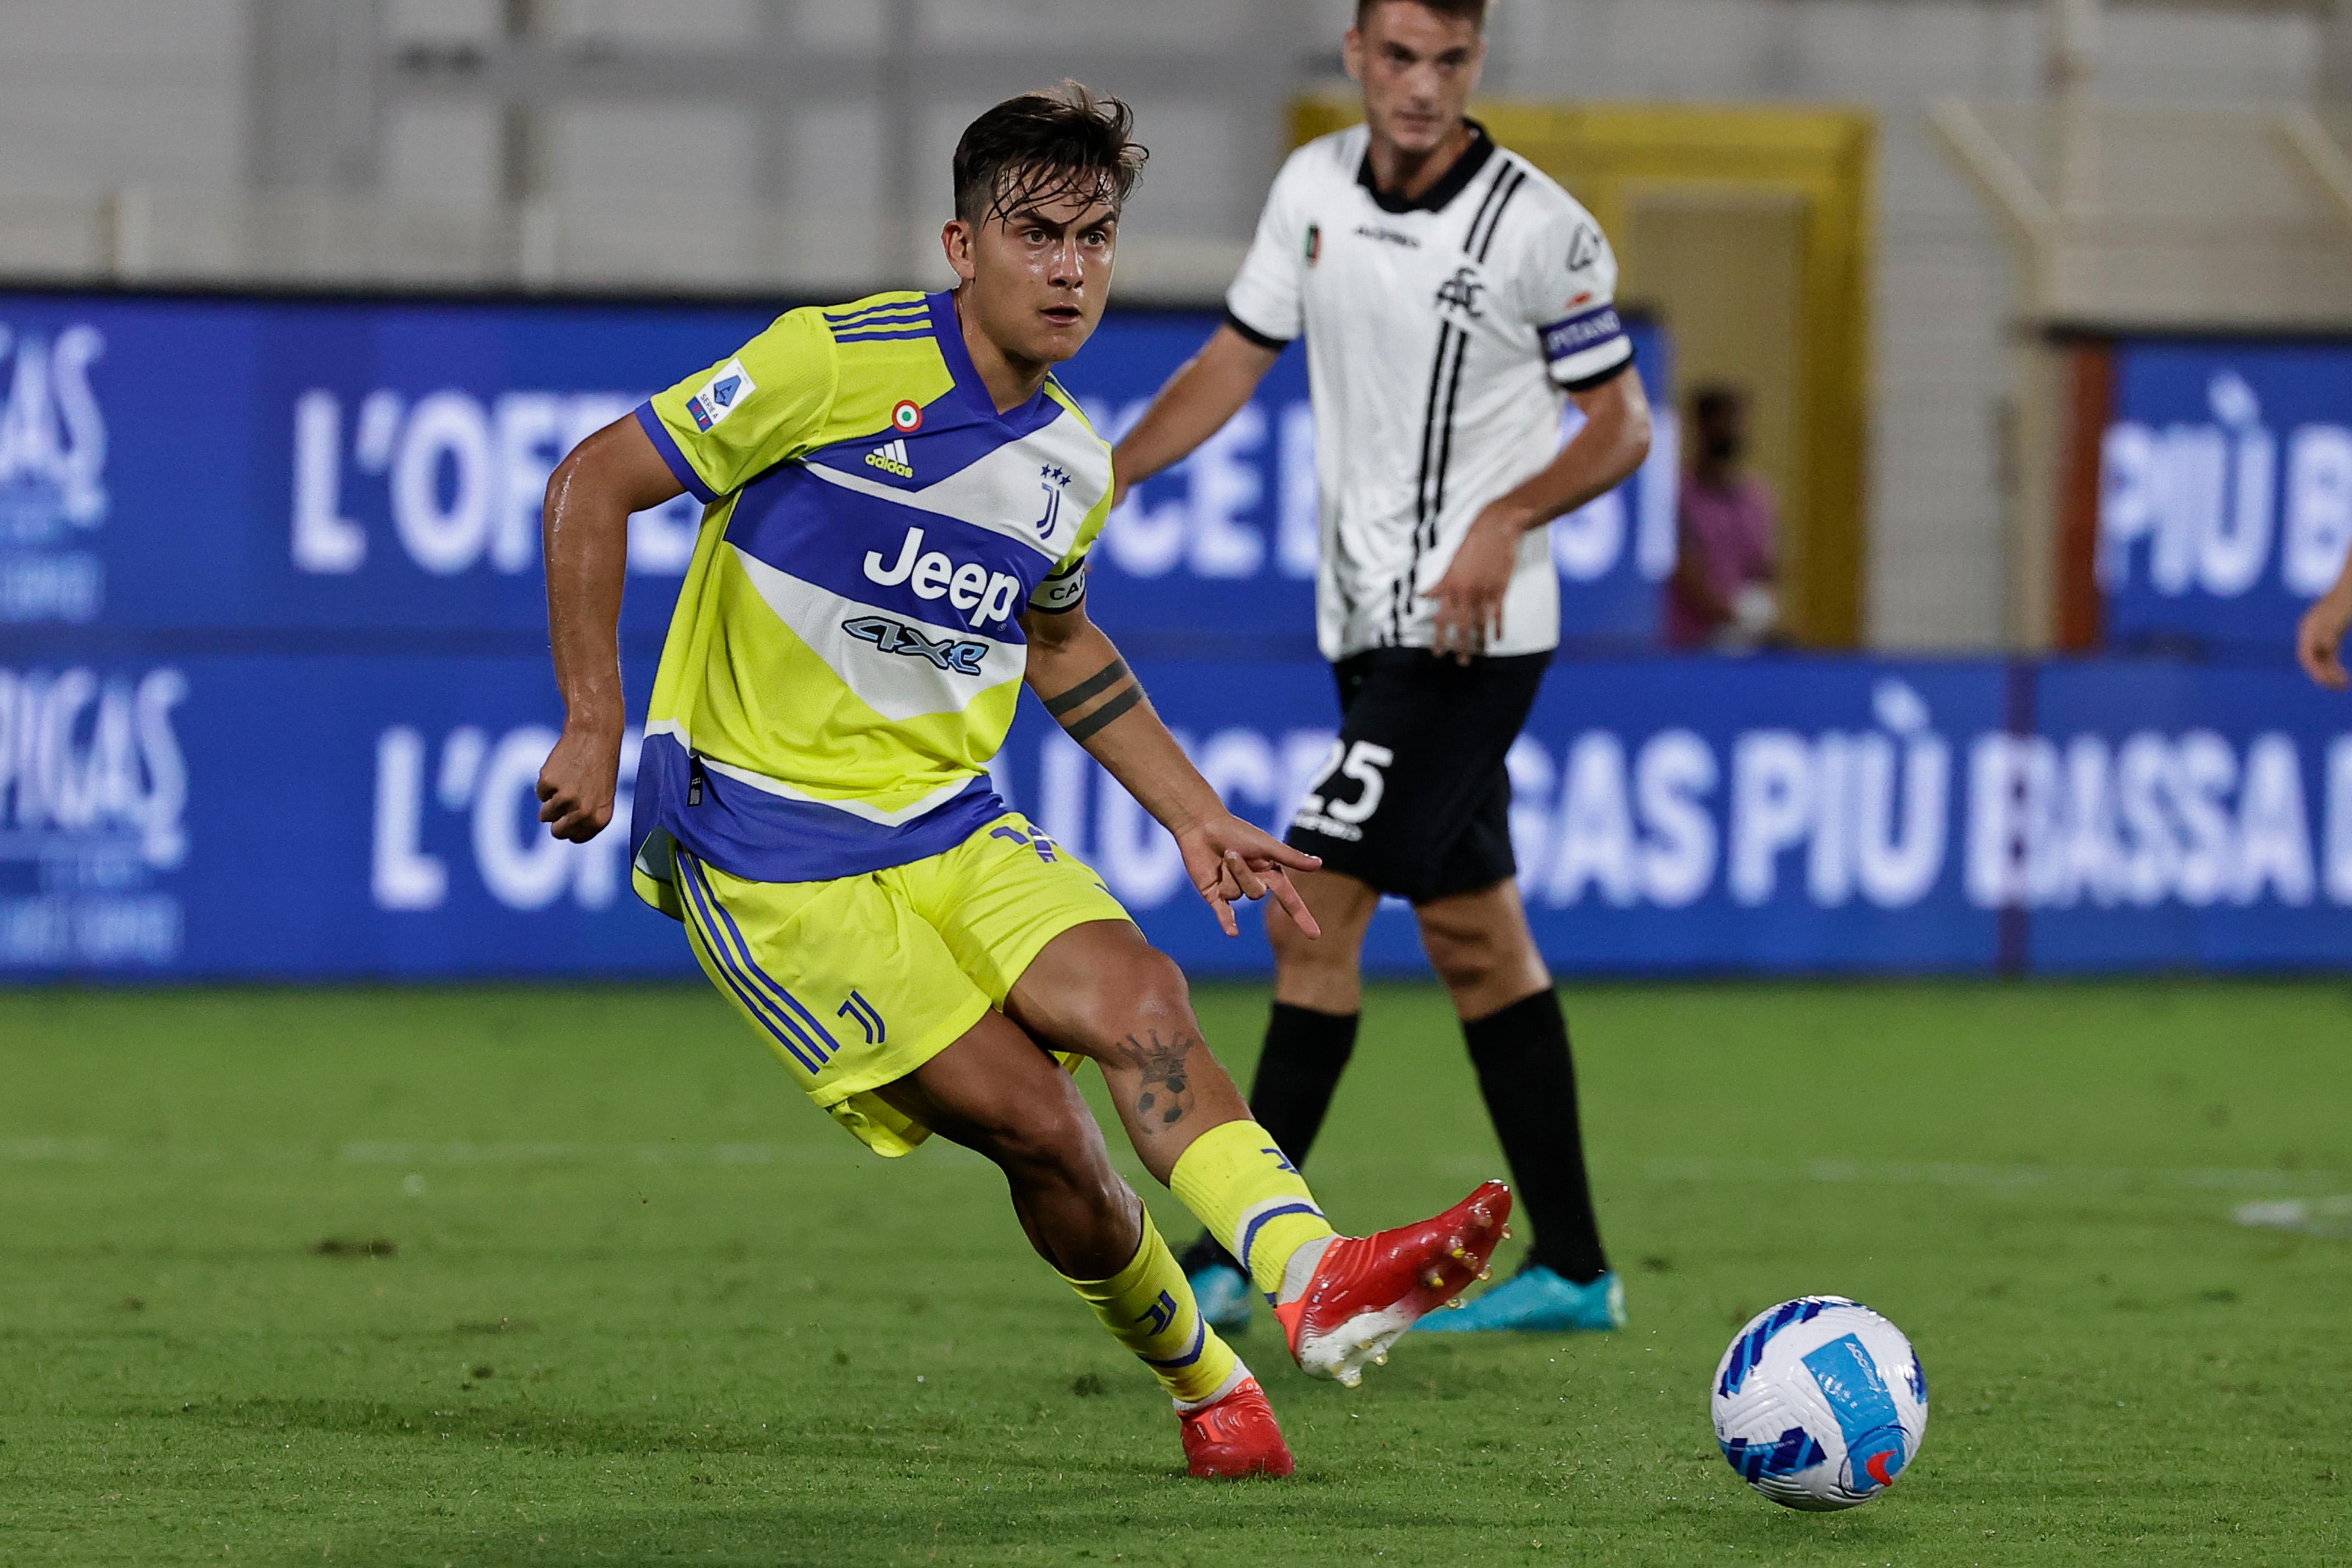 Spezia v Juventus - Italian Serie A